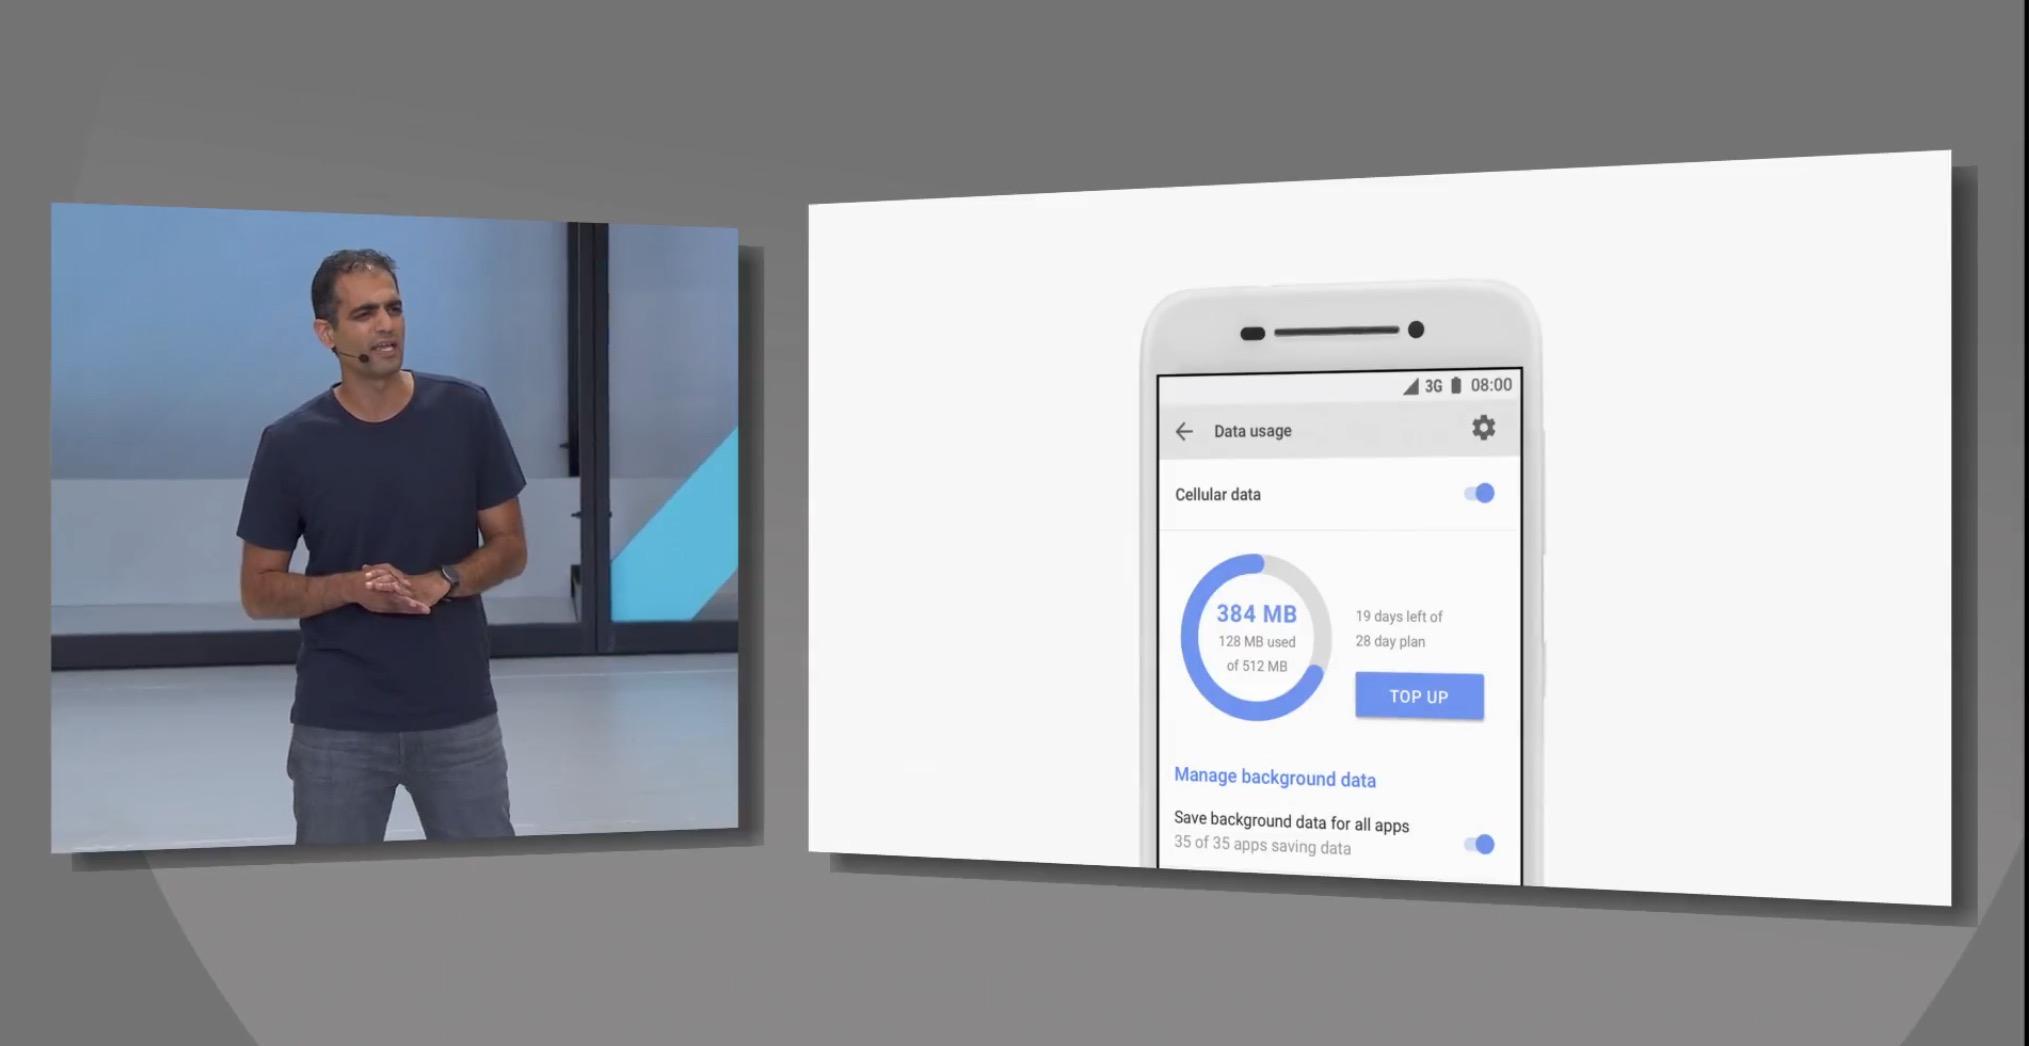 Android Go Announced At Google I/O